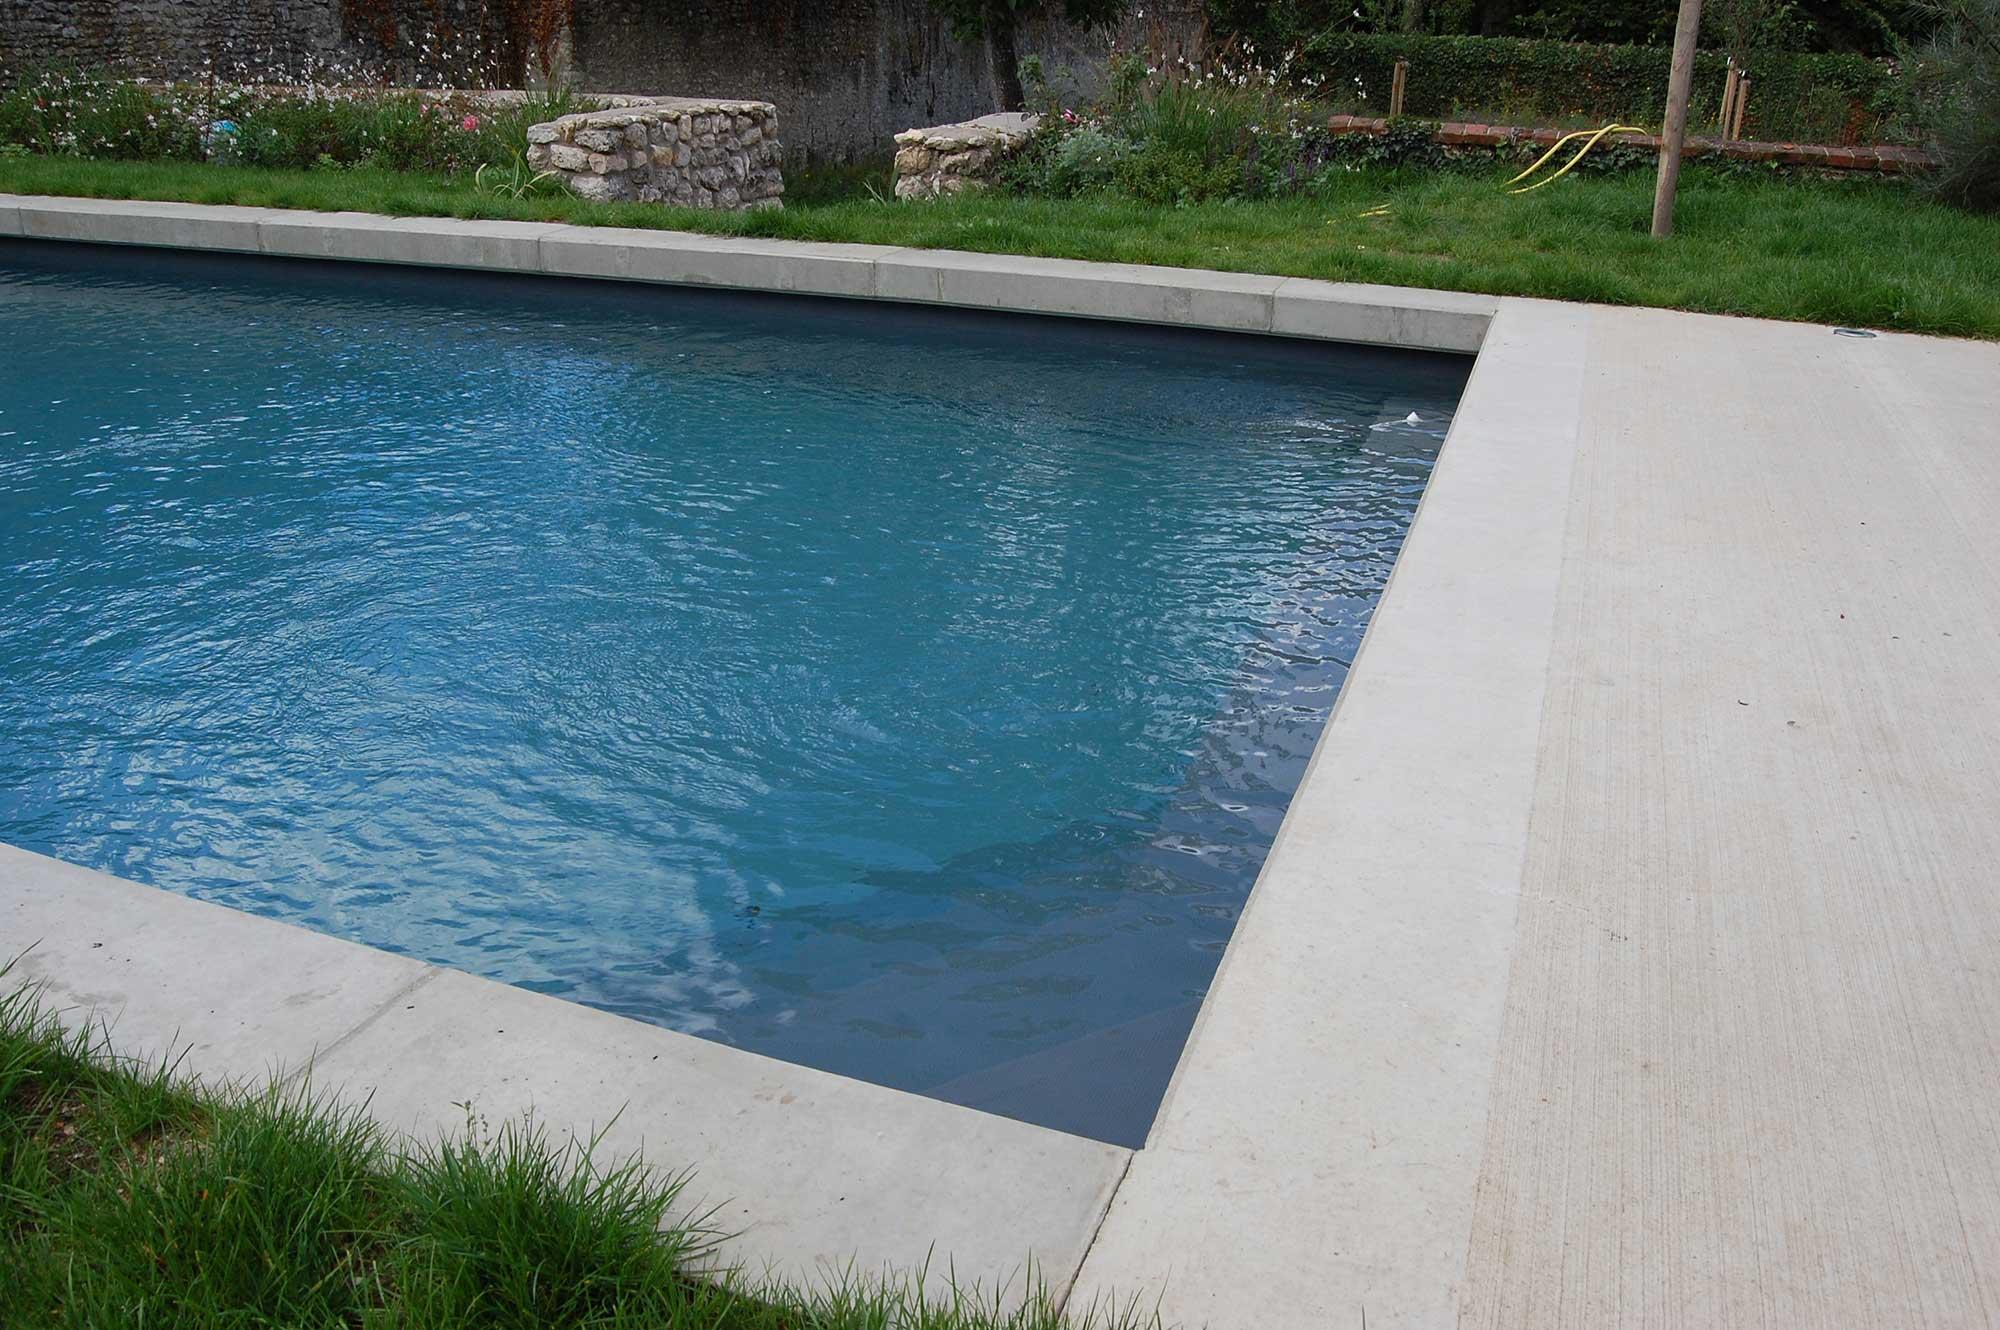 plage piscine ciment